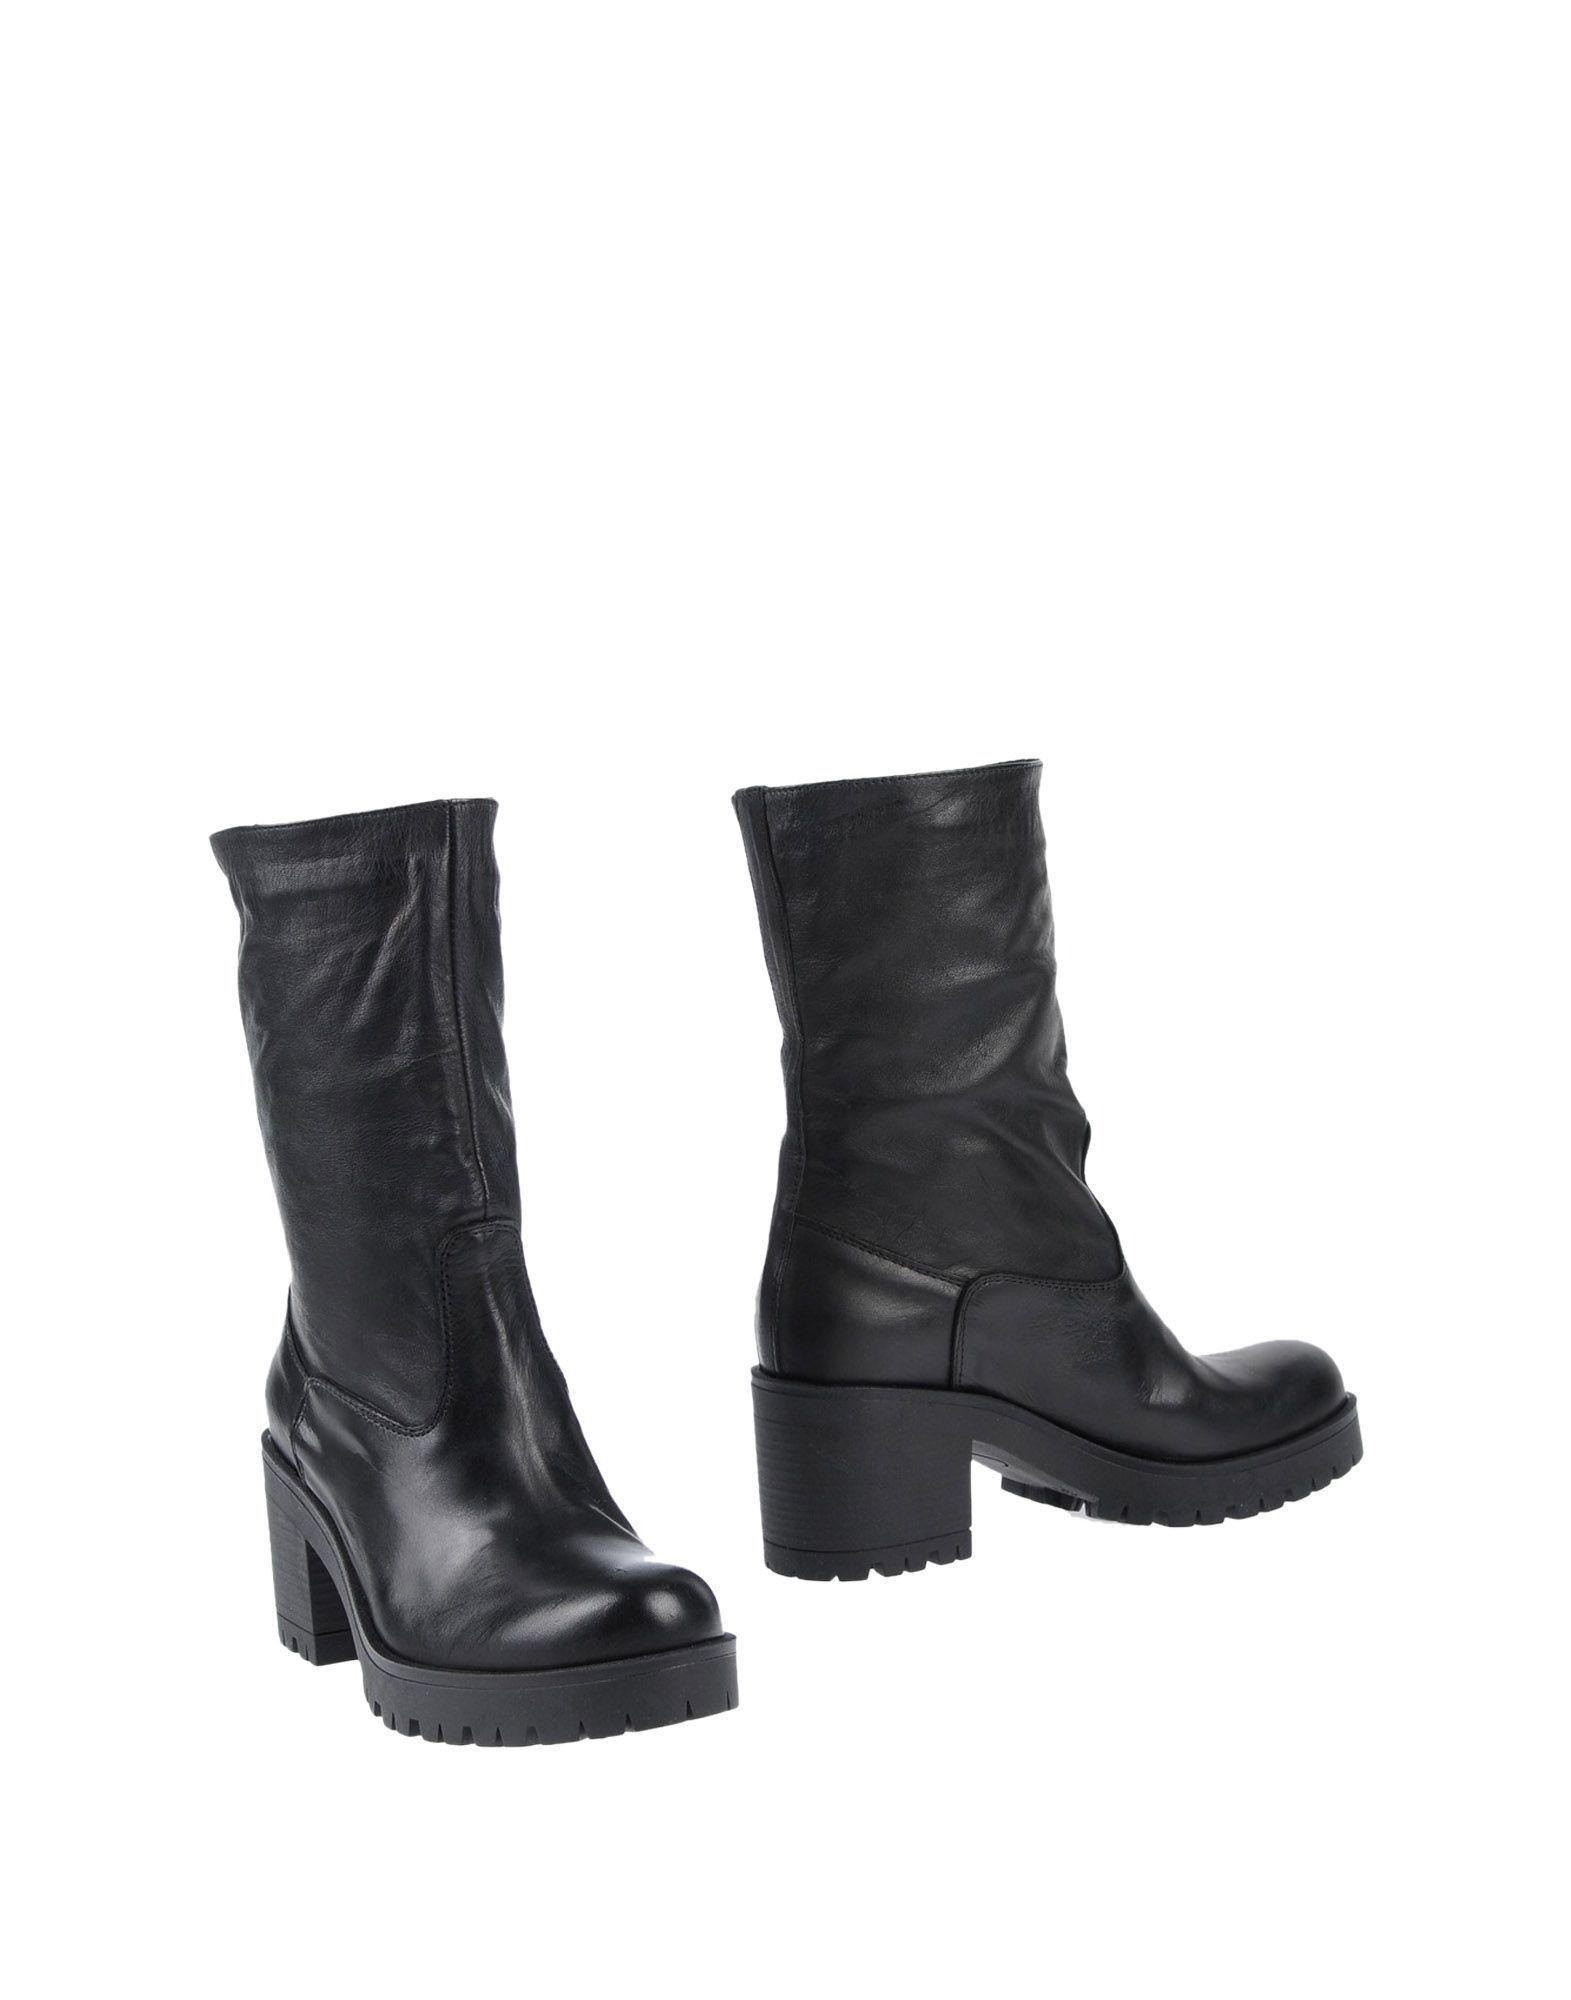 FOOTWEAR Unlace Black Woman Calf